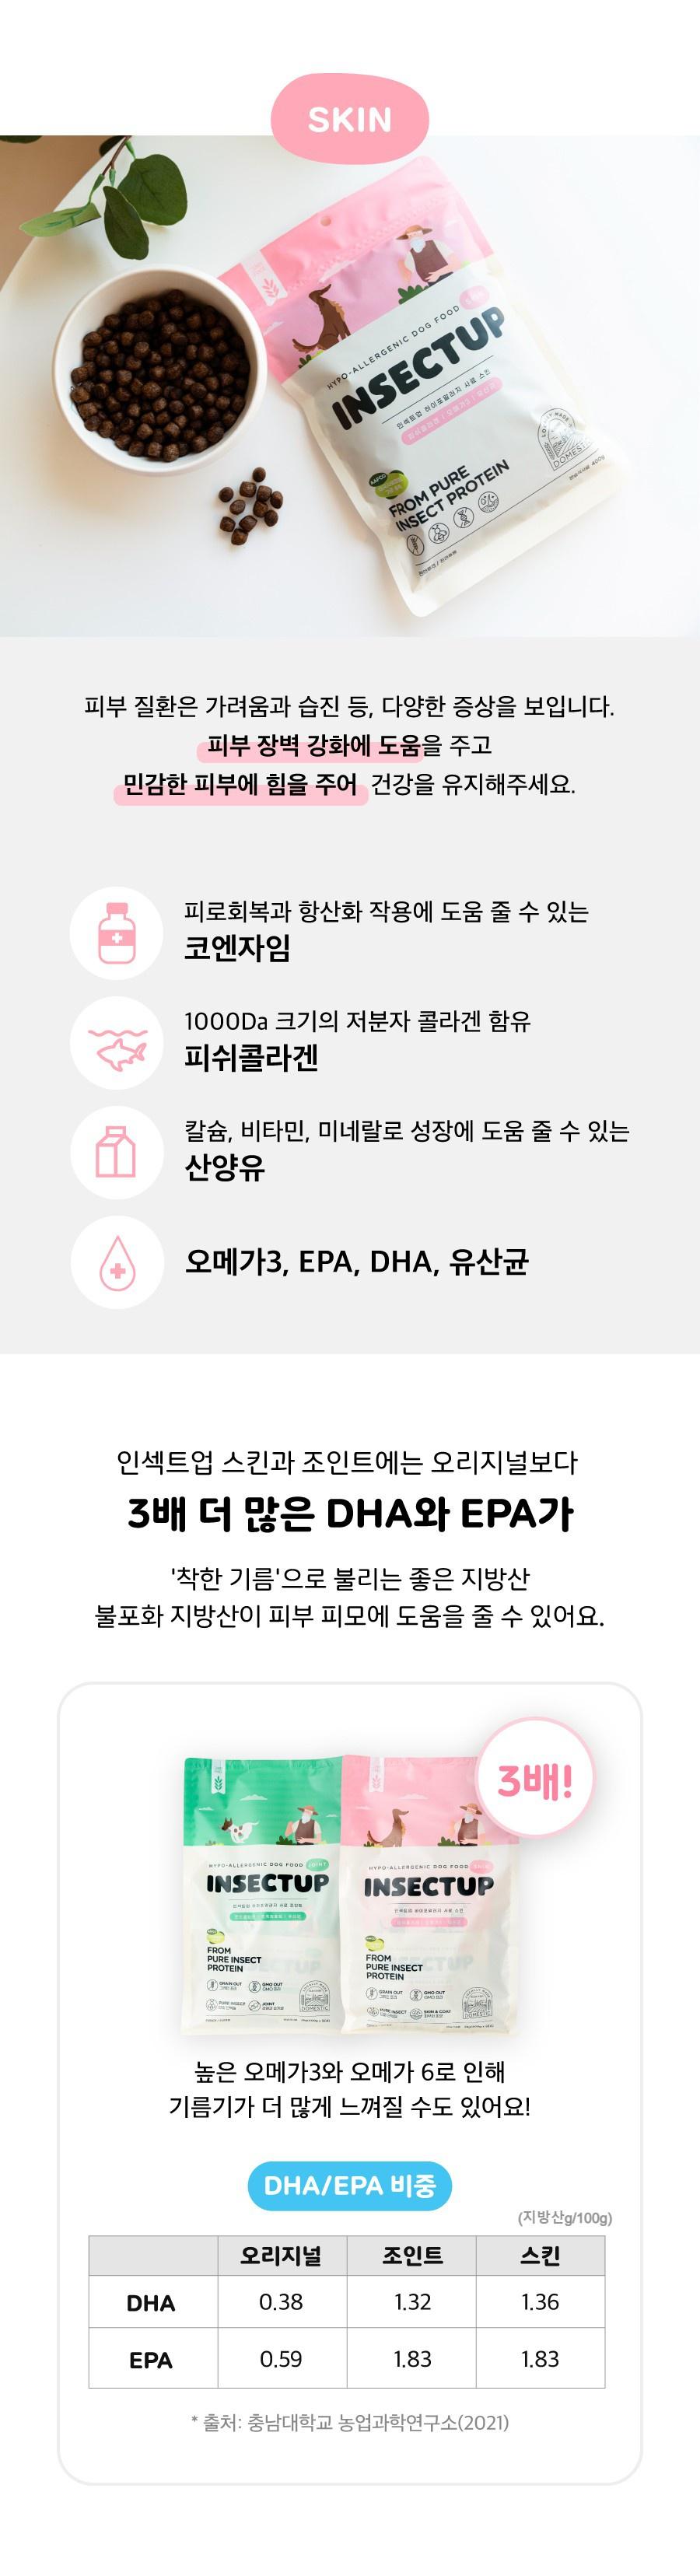 [EVENT] 인섹트업 맛보기 샘플팩 (40g*6팩)-상품이미지-14